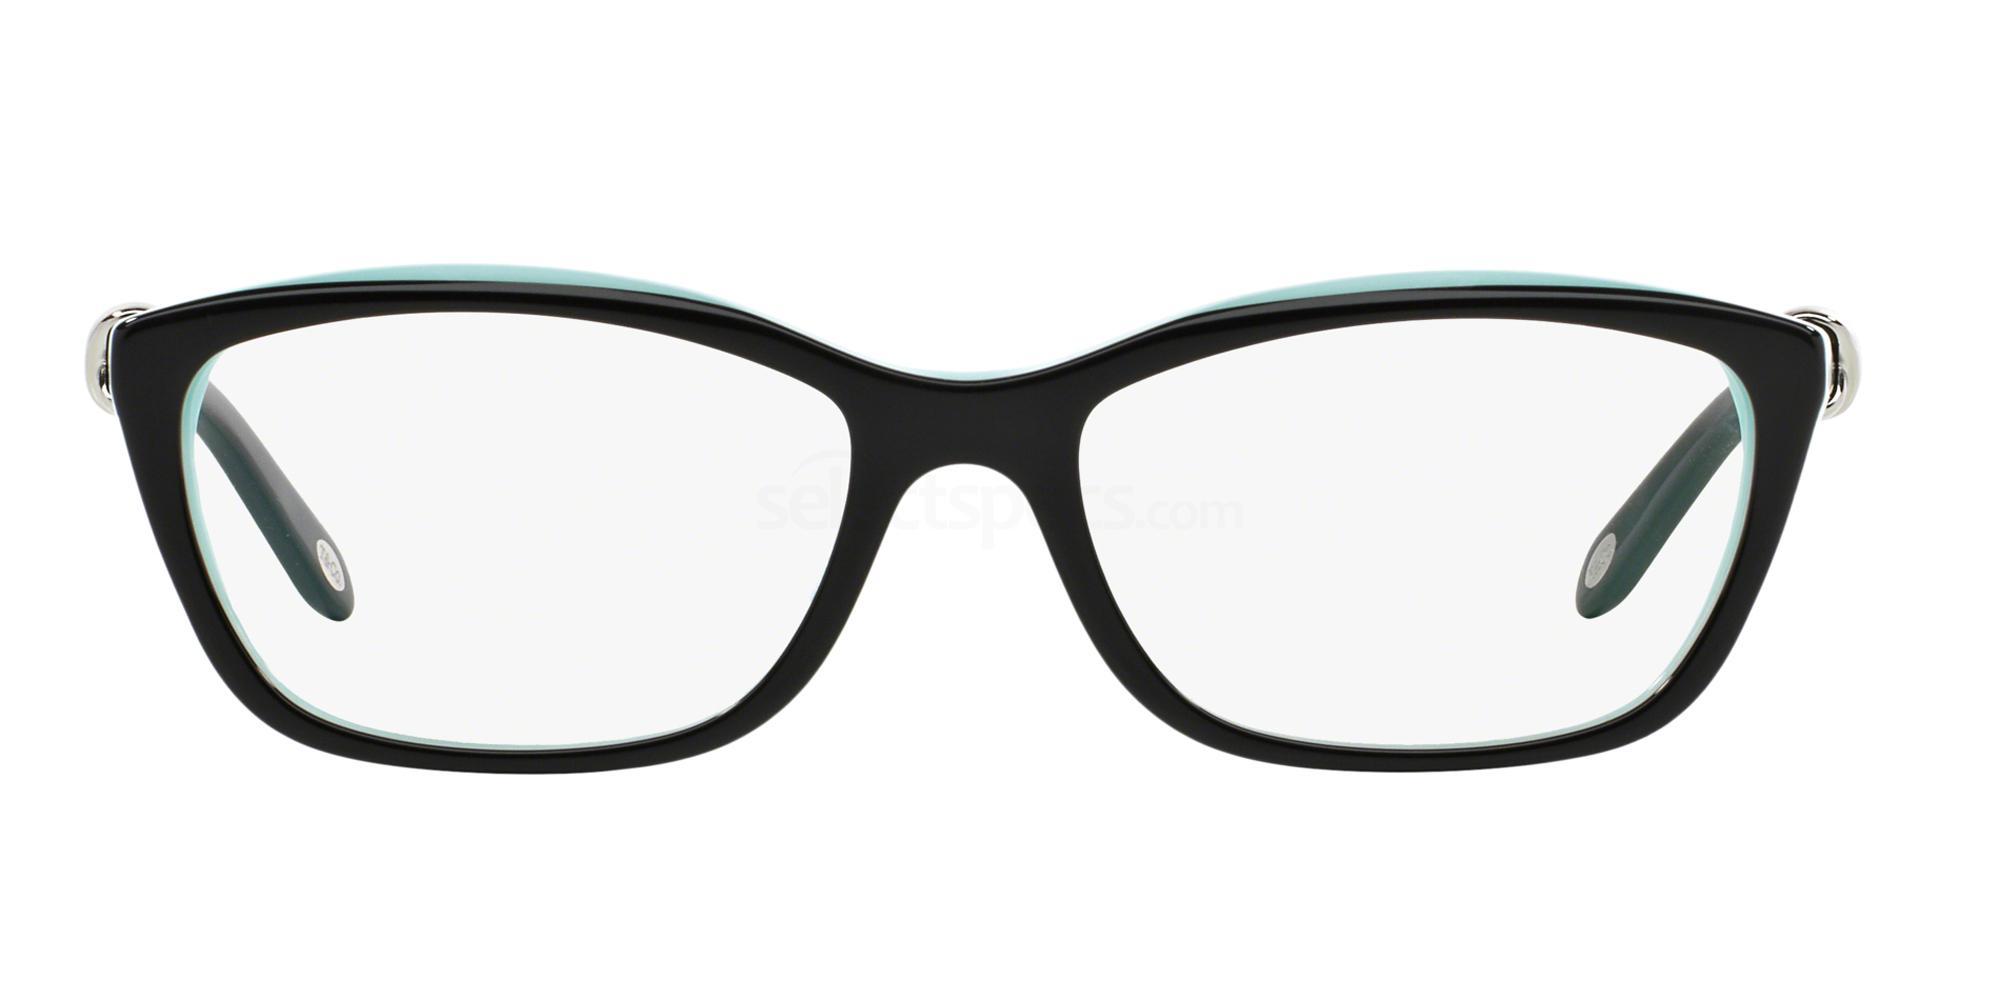 8055 TF2074 Glasses, Tiffany & Co.